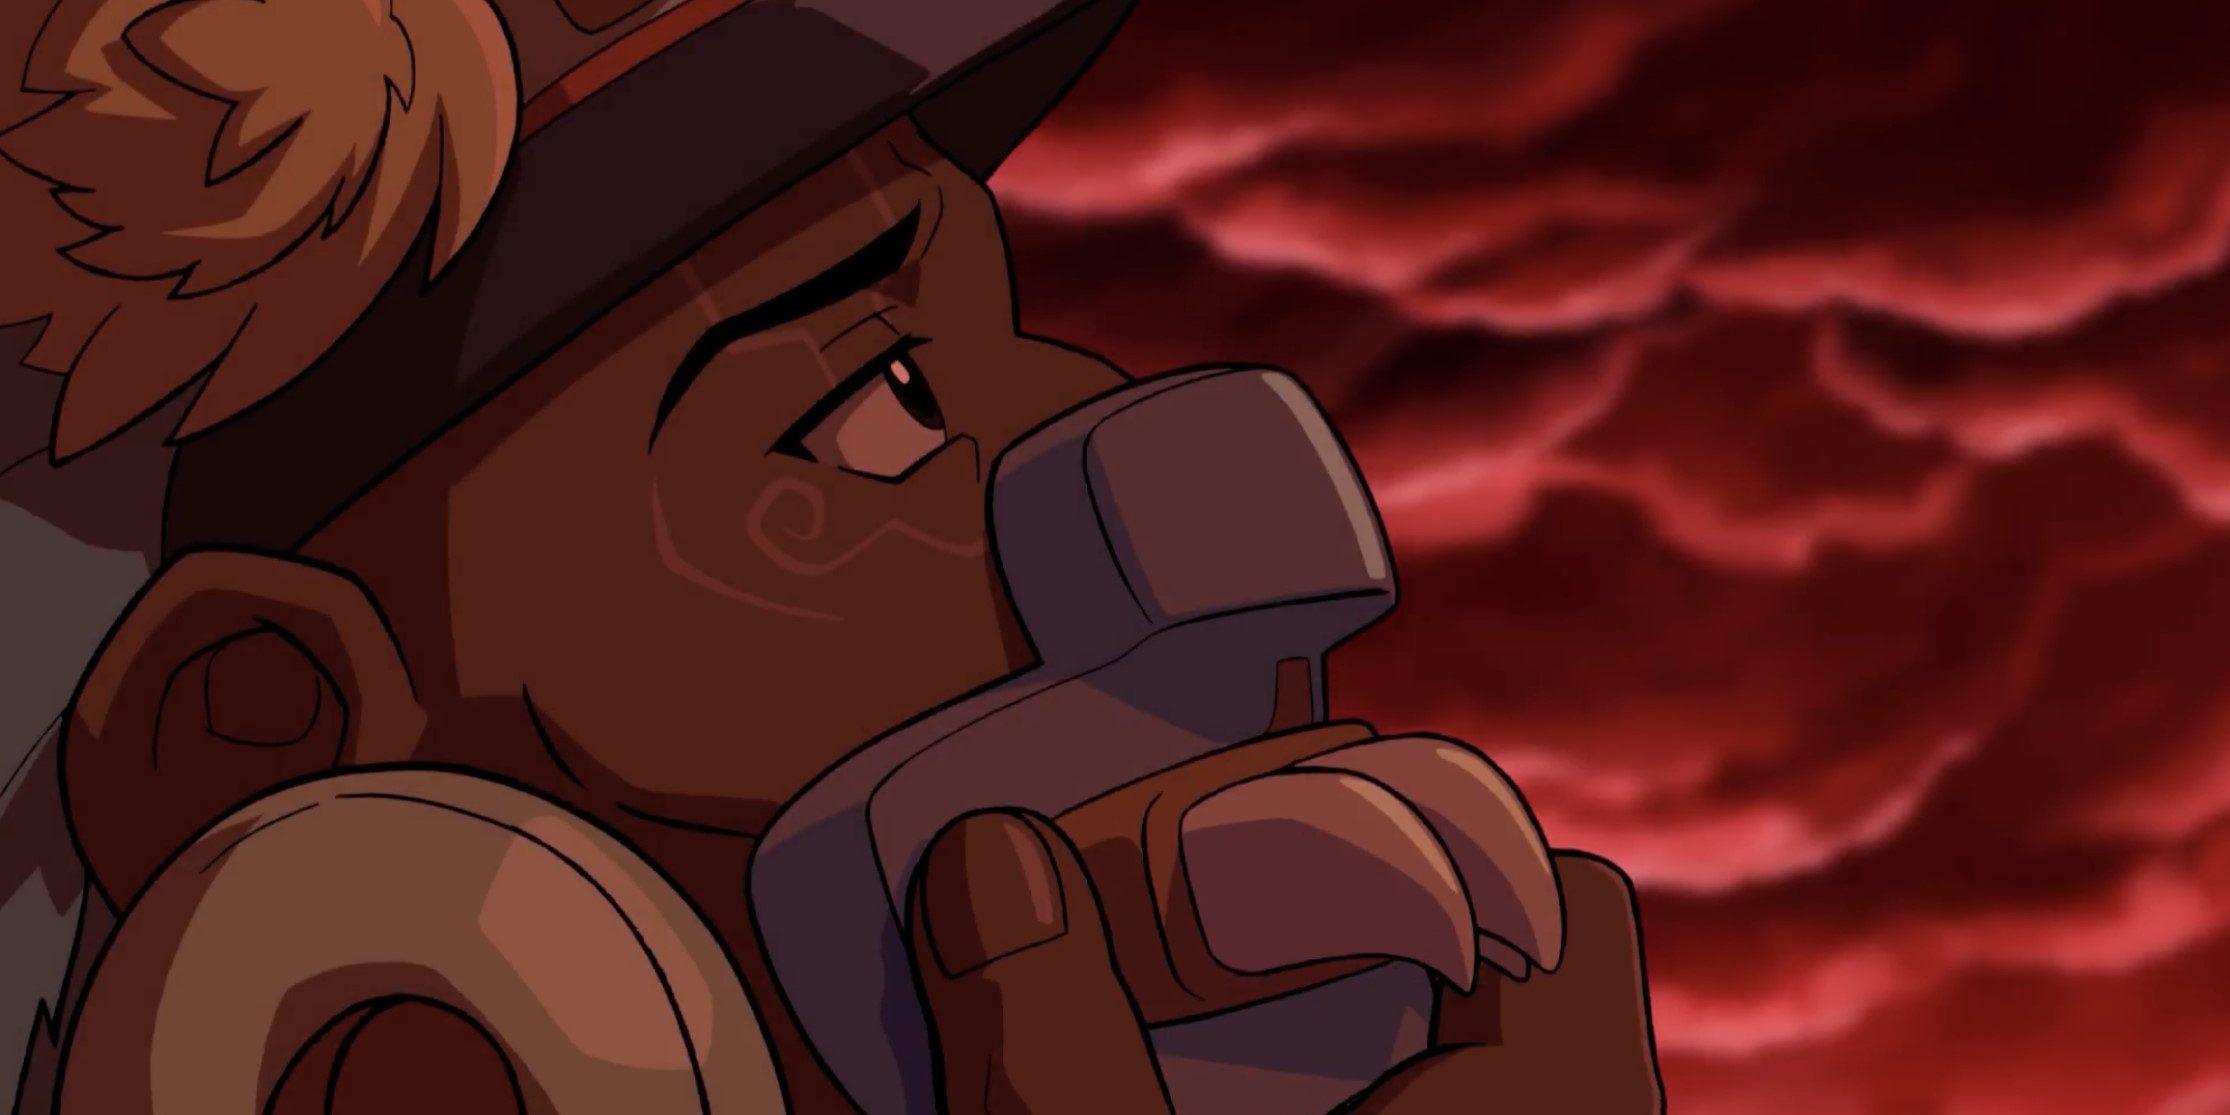 Onyx Equinox: The Crunchyroll Original Gets off To a Bloody Good Start